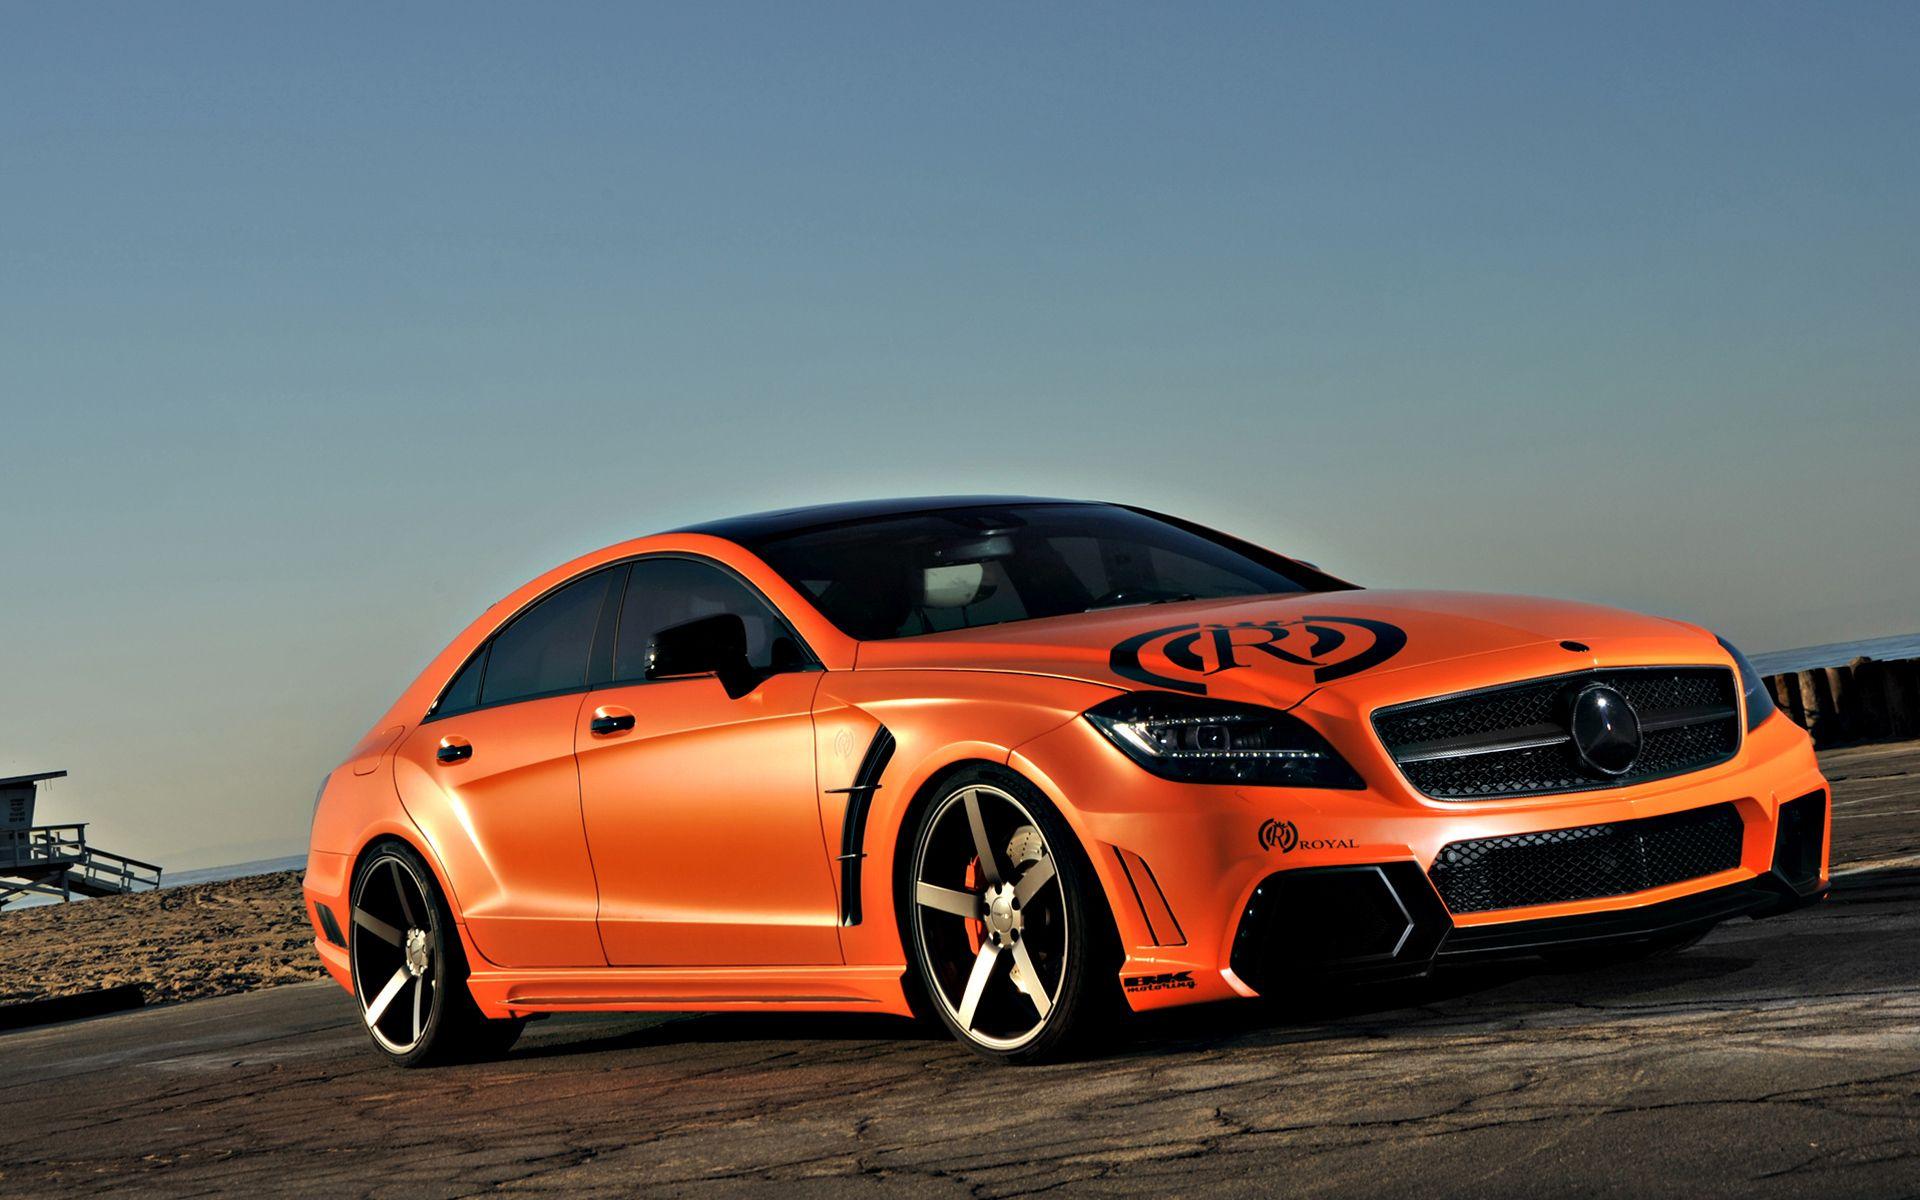 Orange Cars Wallpaper Of Car A Orange Royal Benz On The Road